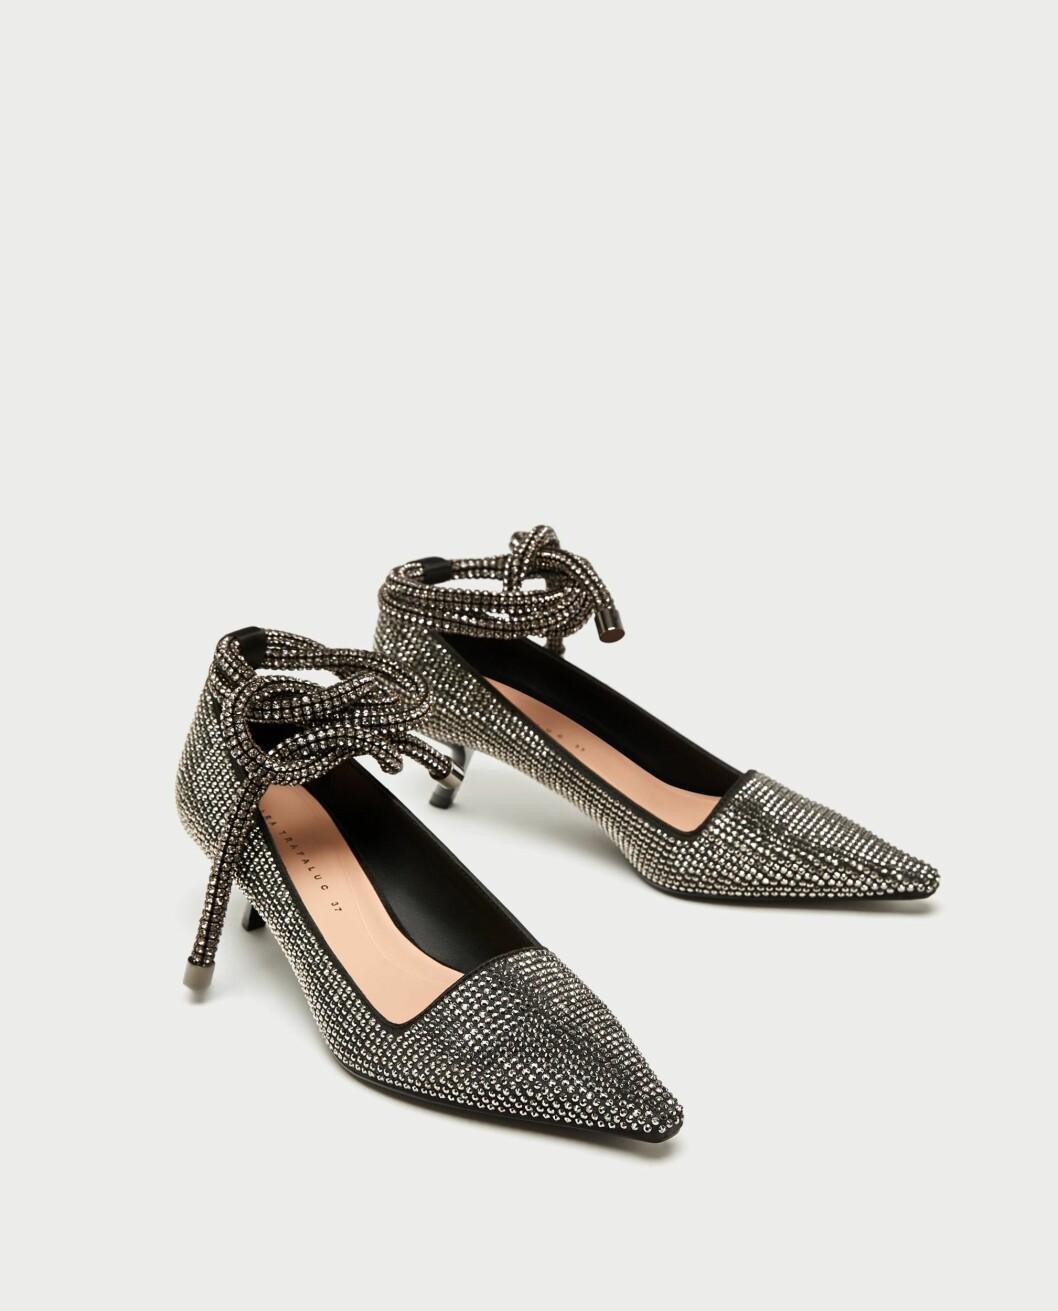 <strong>Sko fra Zara  599,-  https:</strong>//www.zara.com/no/no/pumps-med-glitter-p17213201.html?v1=5141516&v2=269216